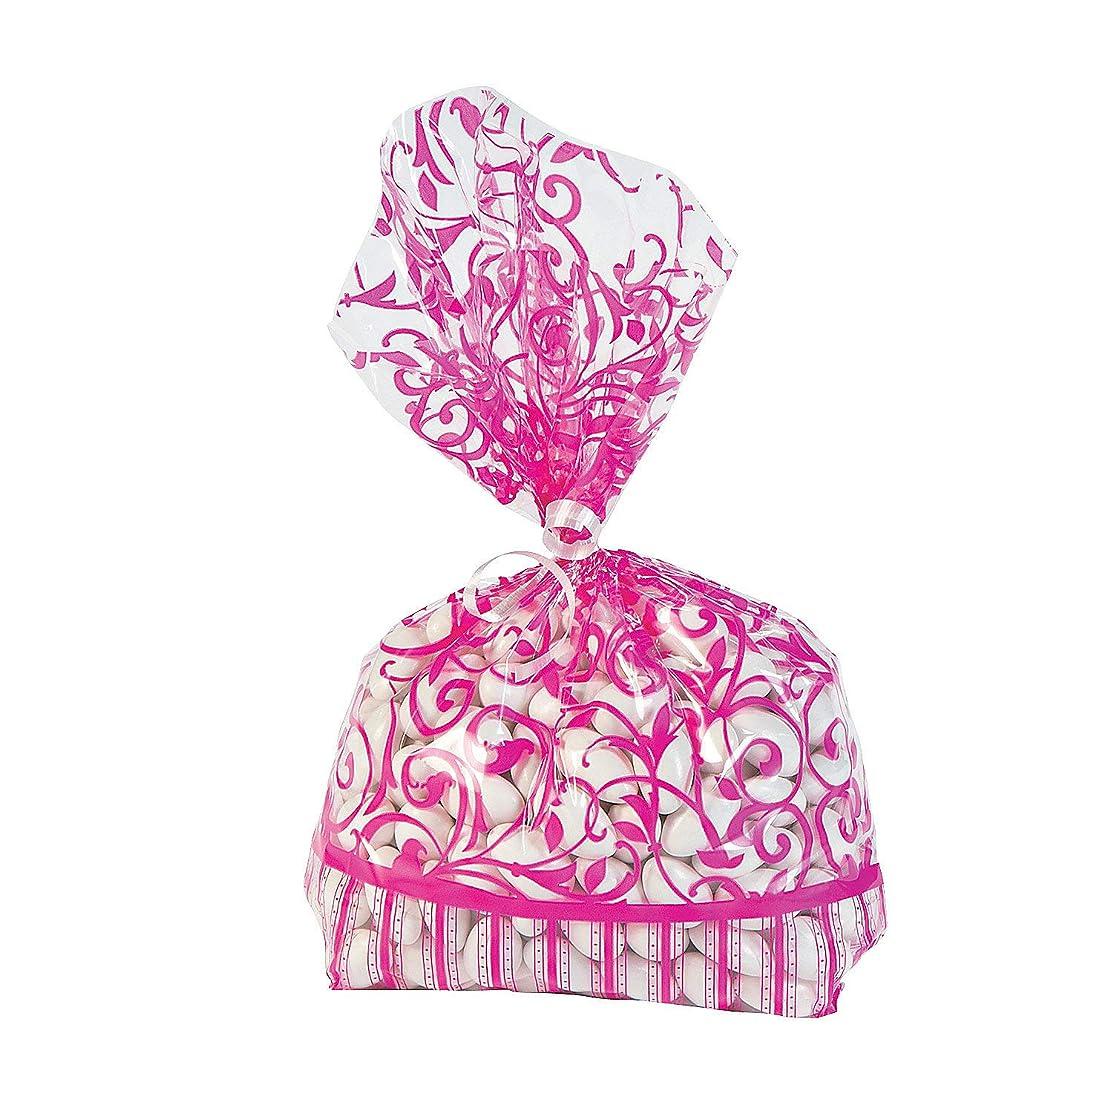 Fun Express - Hot Pink Swirl Cello Bags (dz) for Wedding - Party Supplies - Bags - Cellophane Bags - Wedding - 12 Pieces